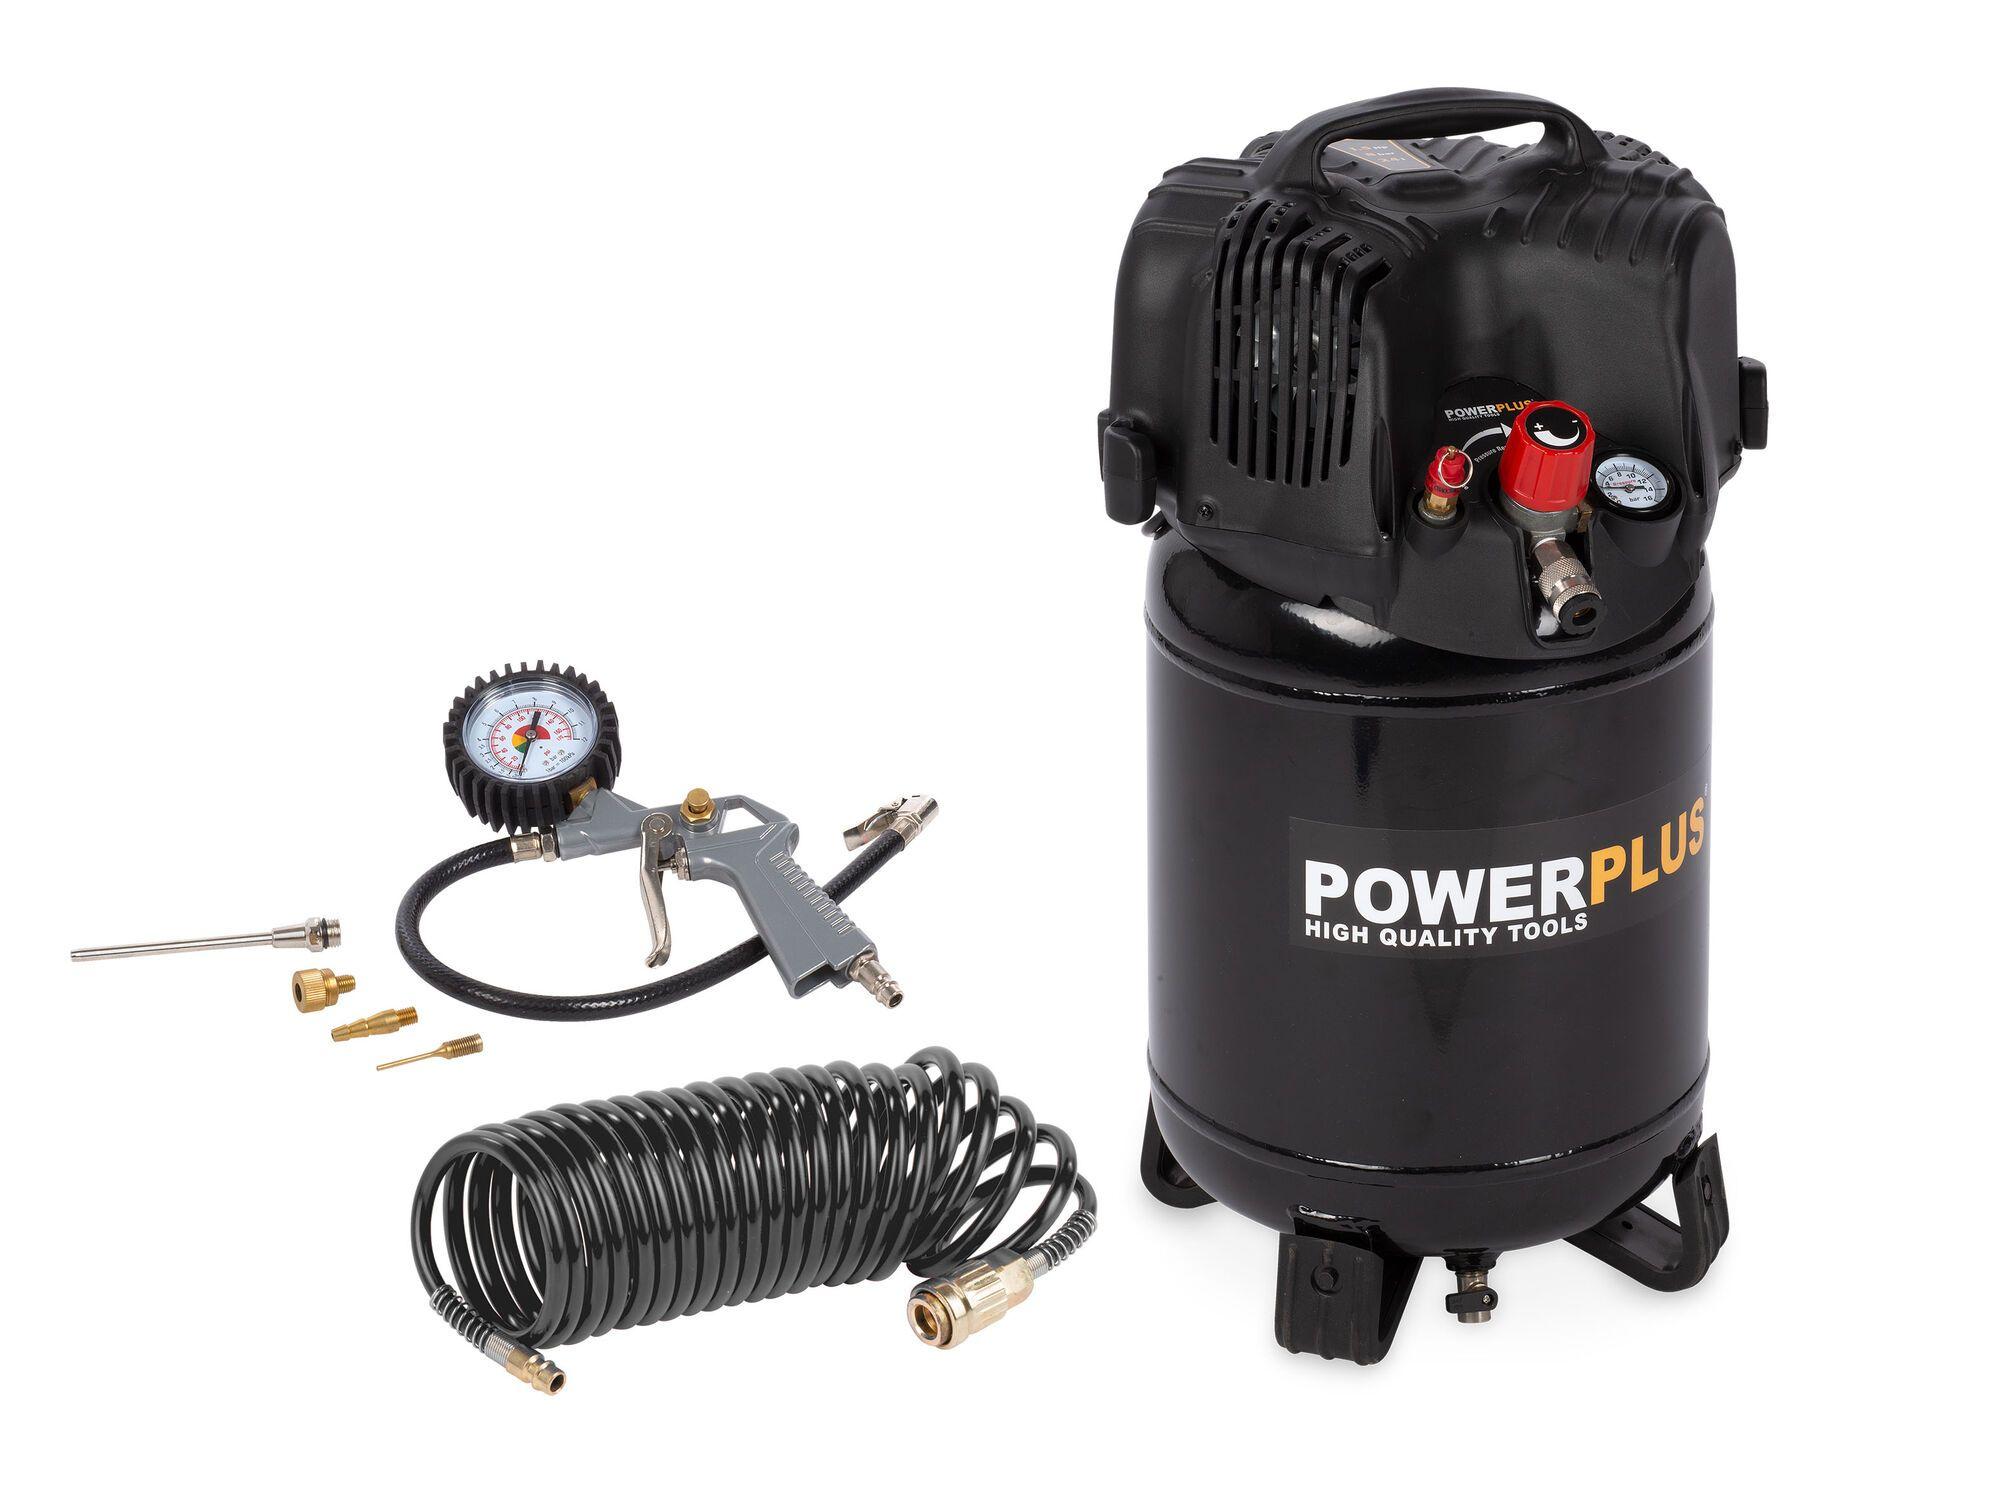 Powerplus POWX1731 1100W Compressor   Olievrij + 12 Accessoires